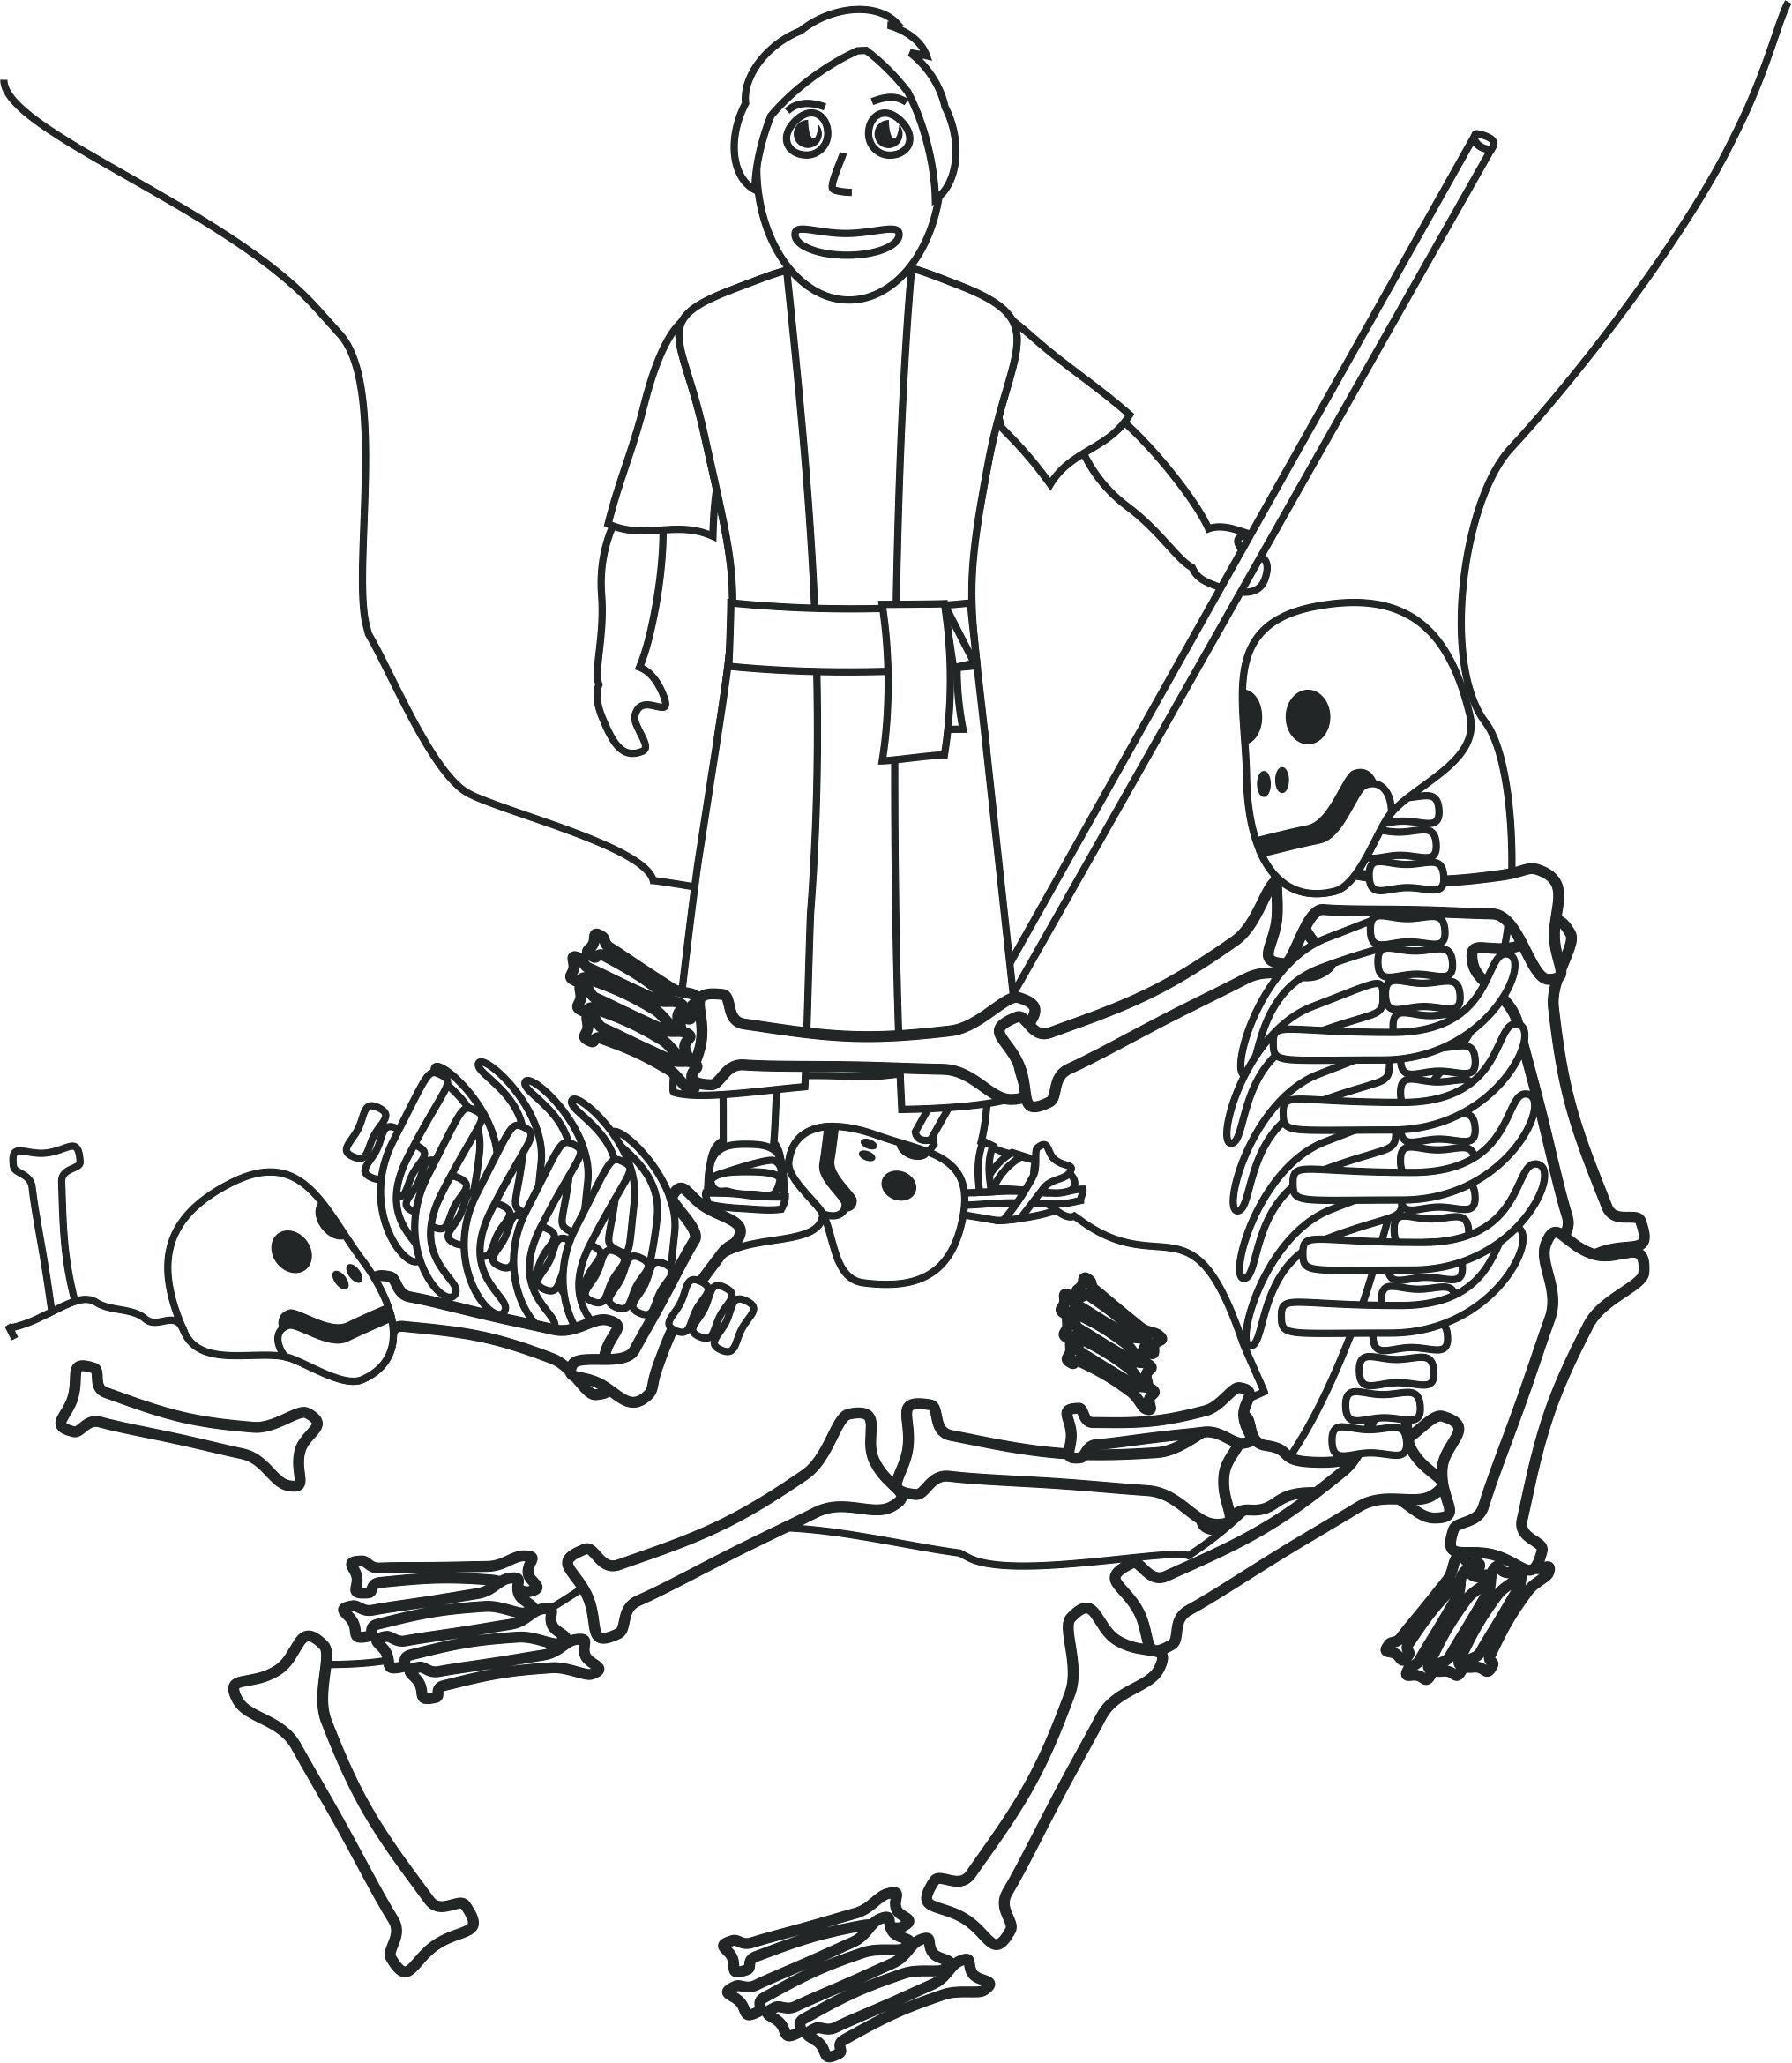 Skeleton Coloring Pages Printable Human Skeleton Coloring